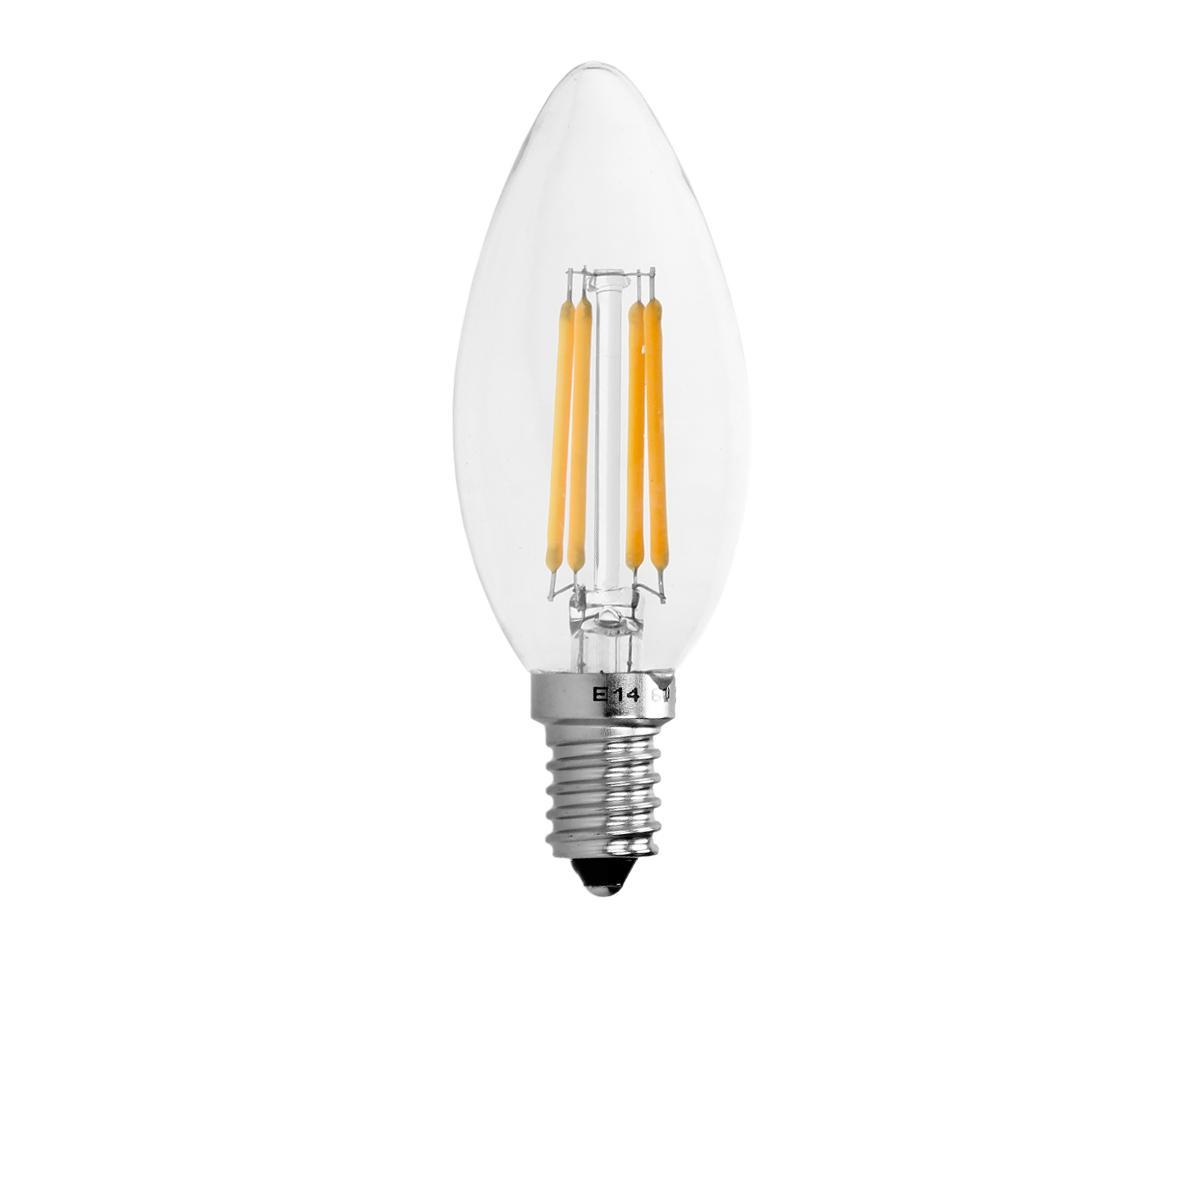 Ecd Germany ECD Germany 6 x LED Filament de la bougie E14 4W 414 Lumens Angle de courant alternatif 120 ° 220-240 V reste caché et r